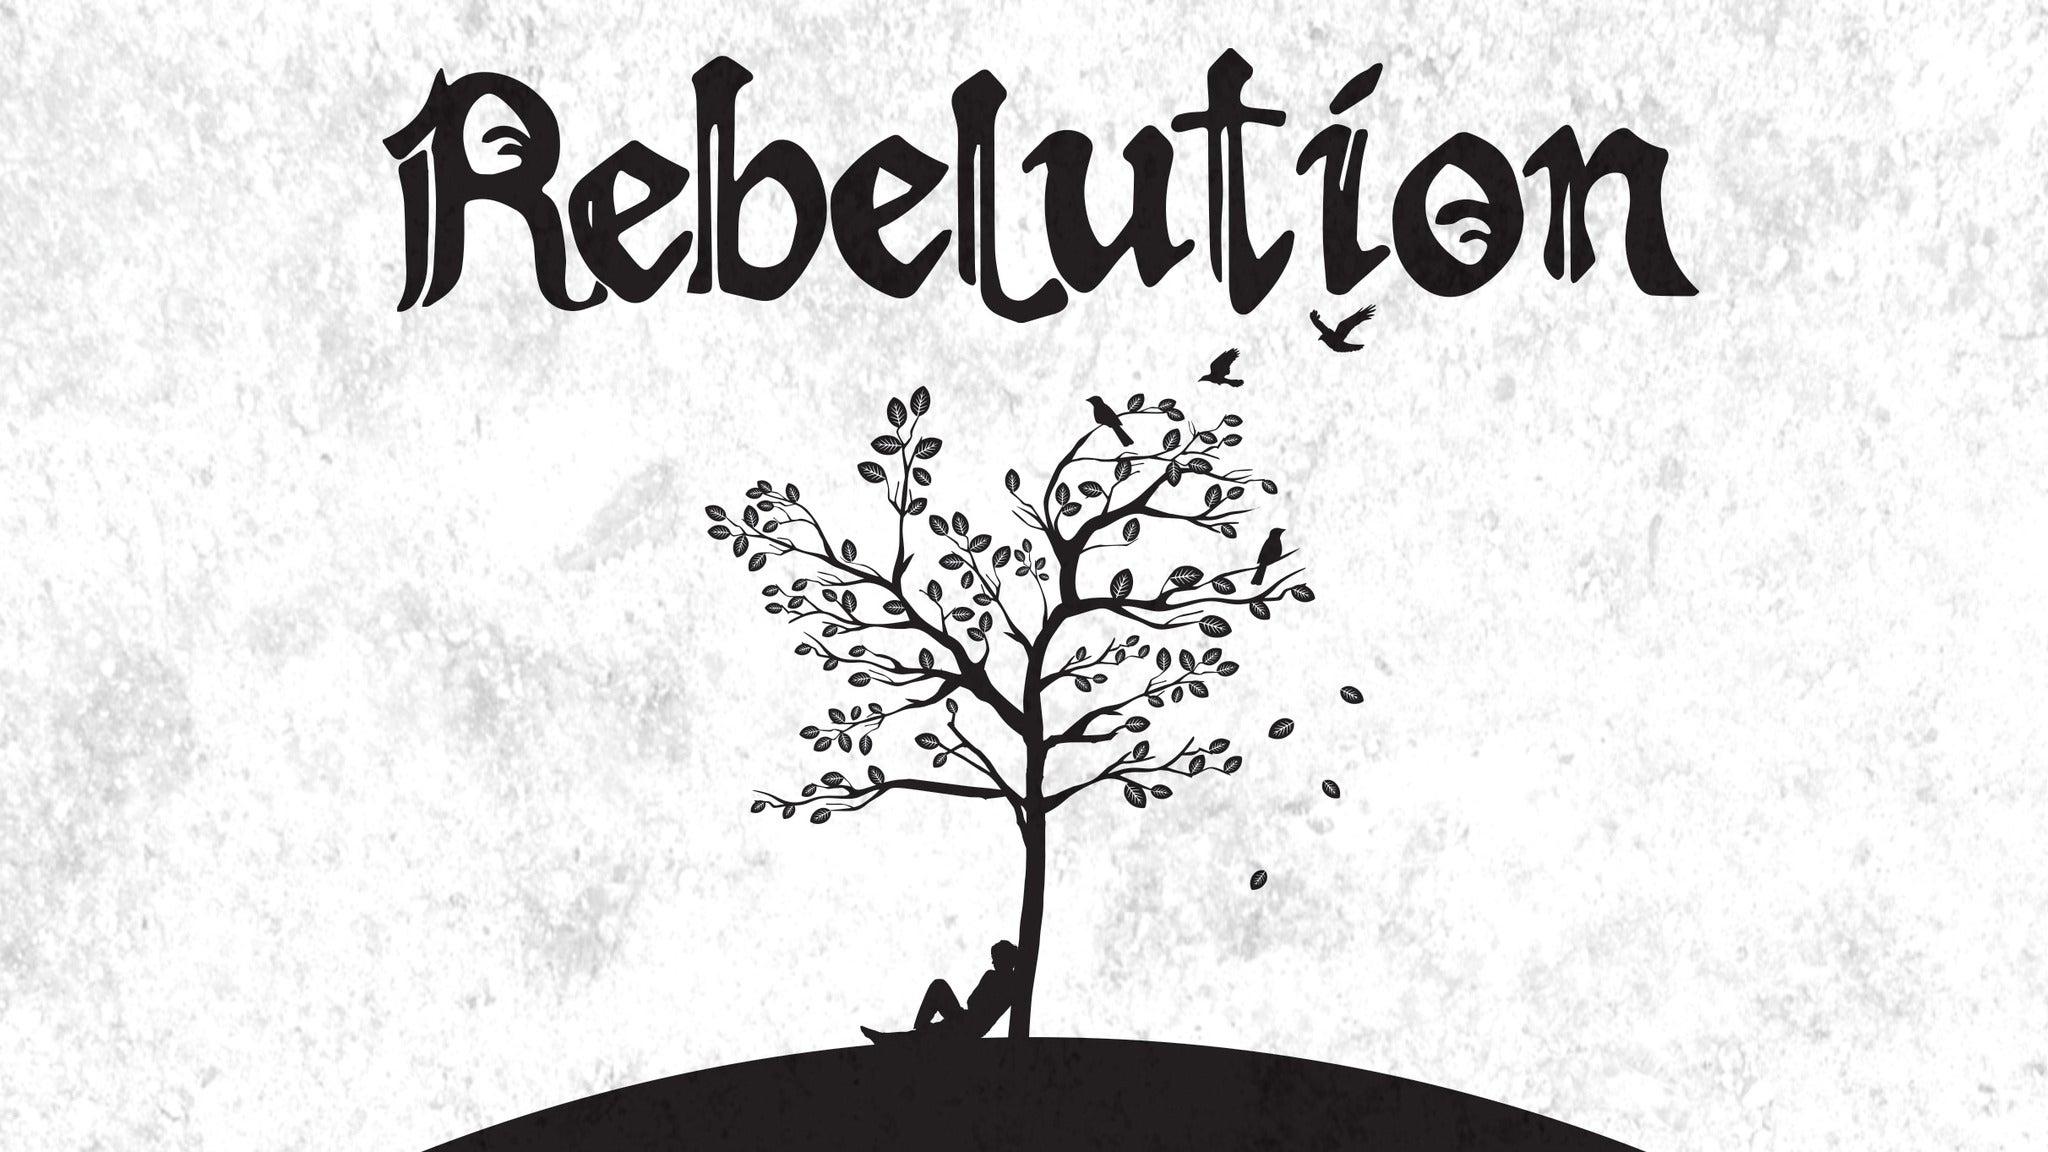 Rebelution, Passafire at Senator Theatre